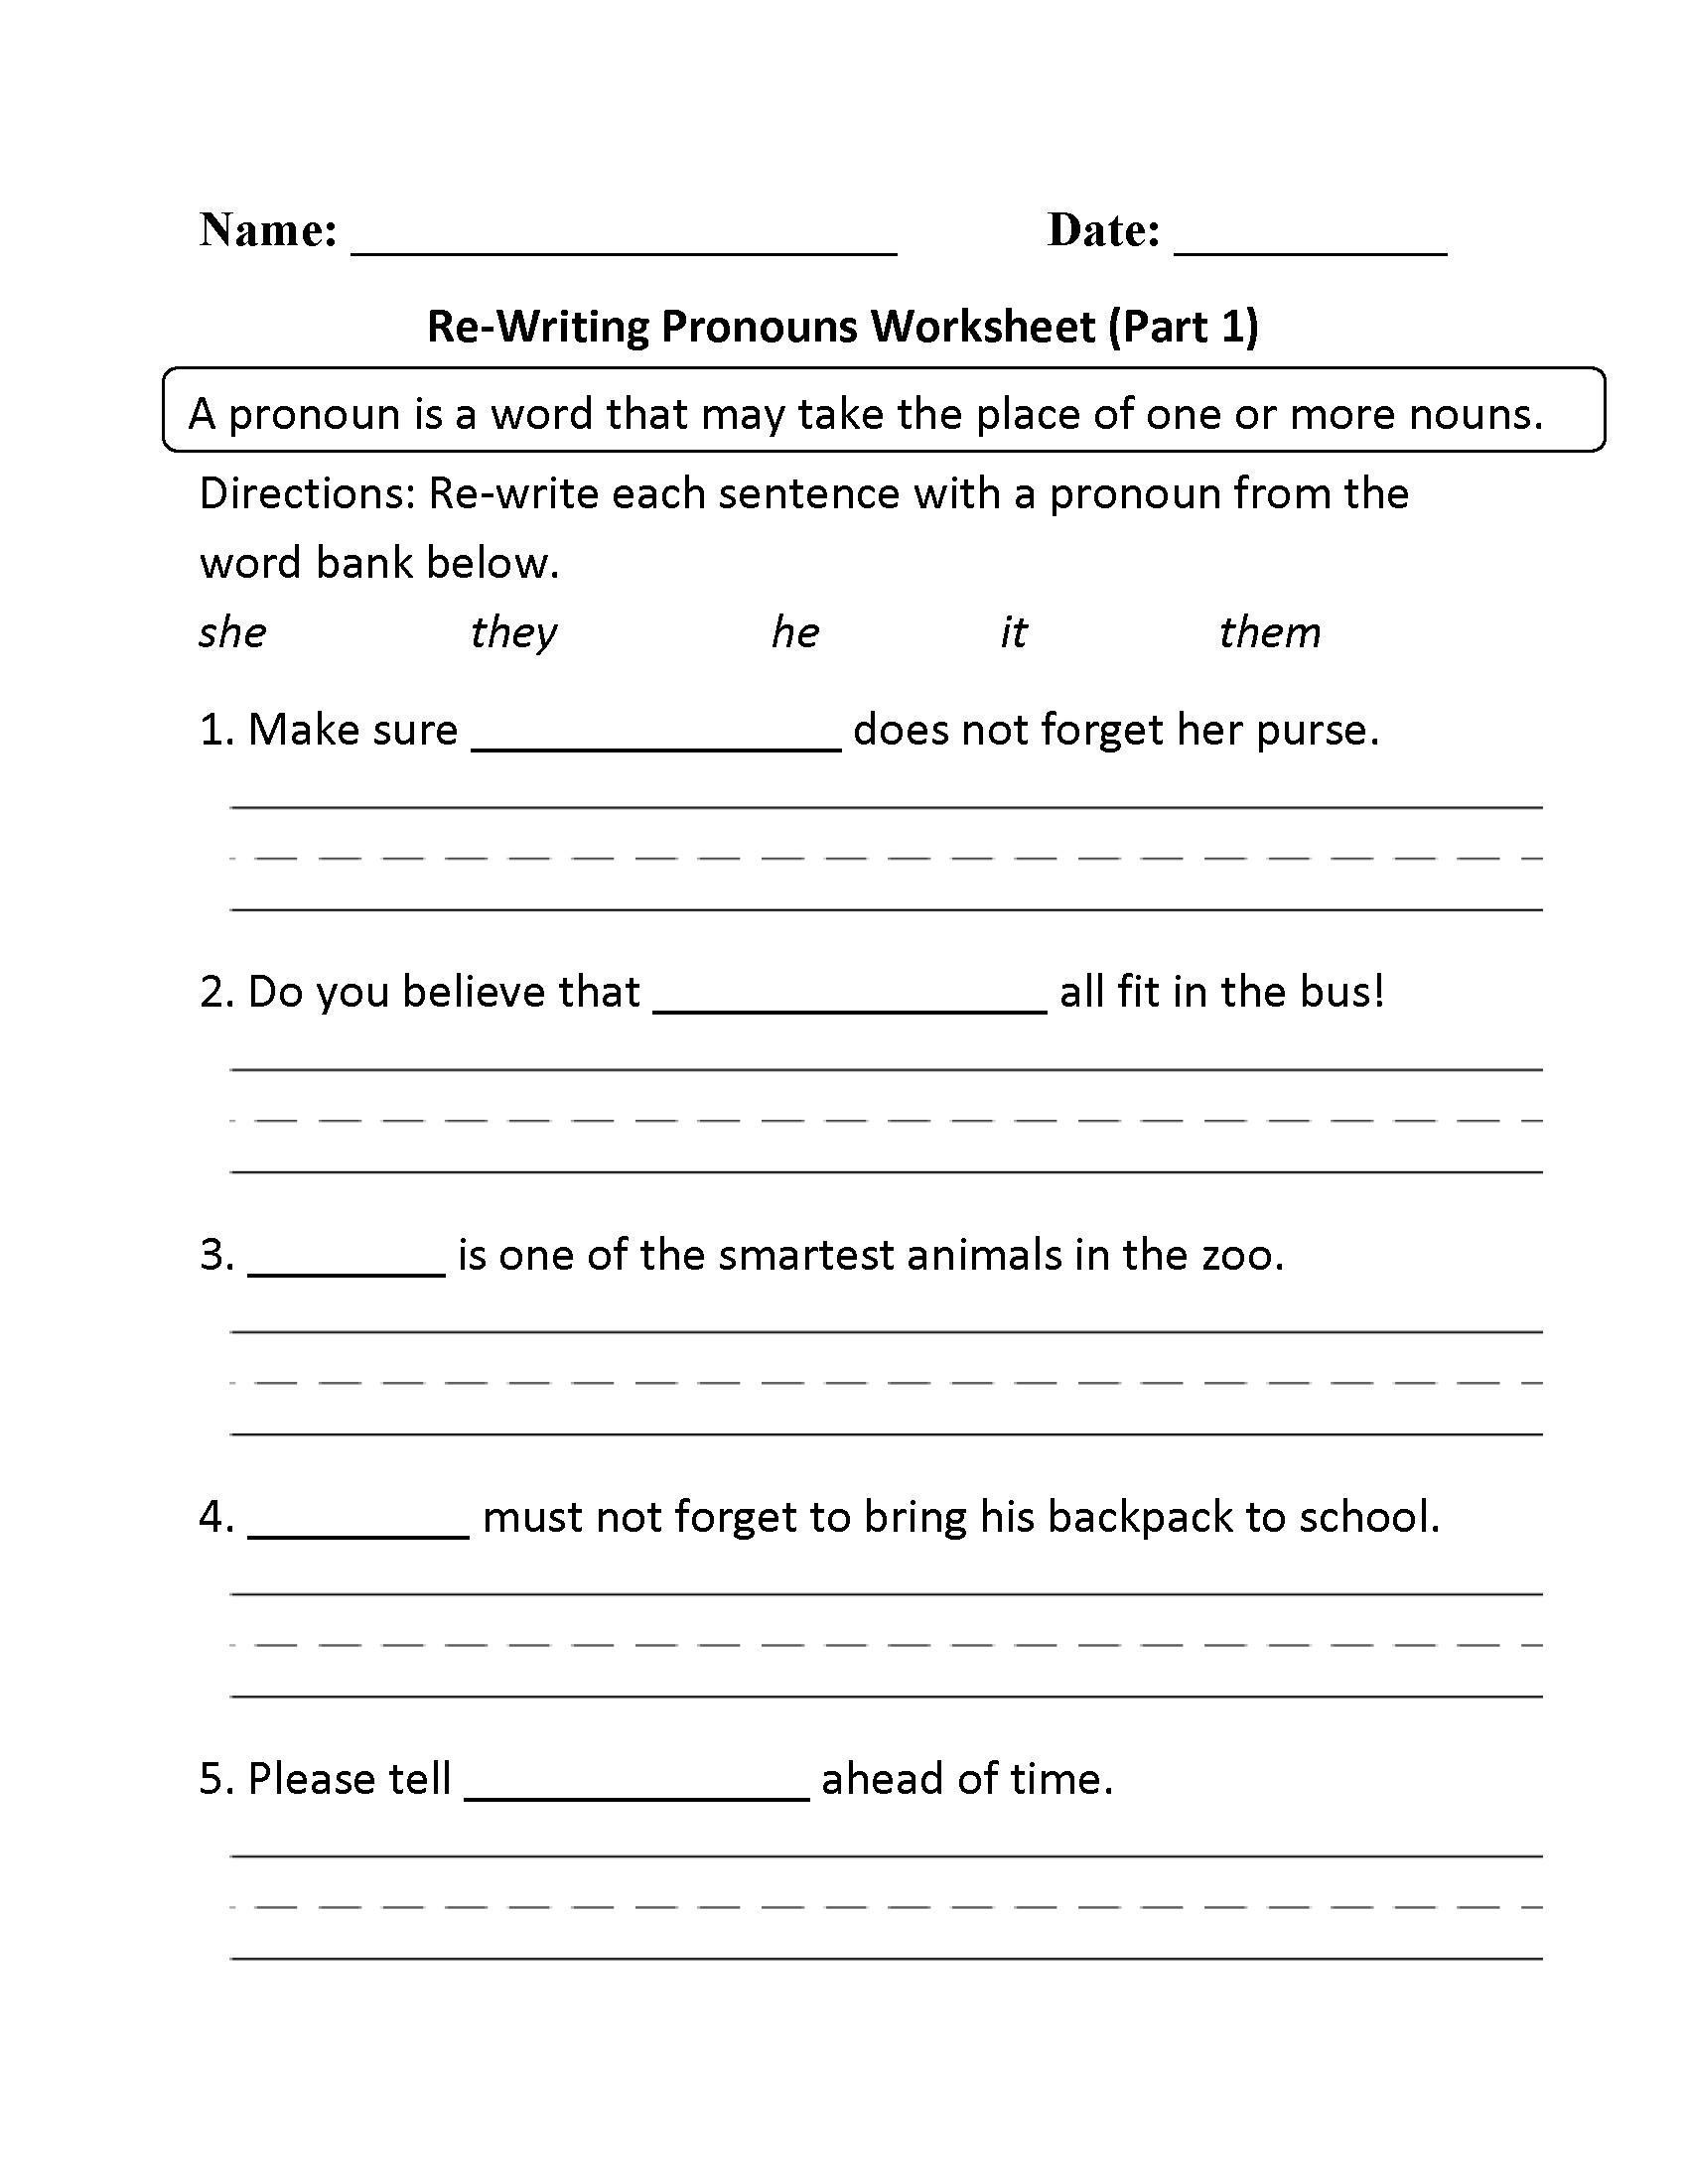 Pronouns Worksheets | Regular Pronouns Worksheets - Free Printable Pronoun Worksheets For 2Nd Grade